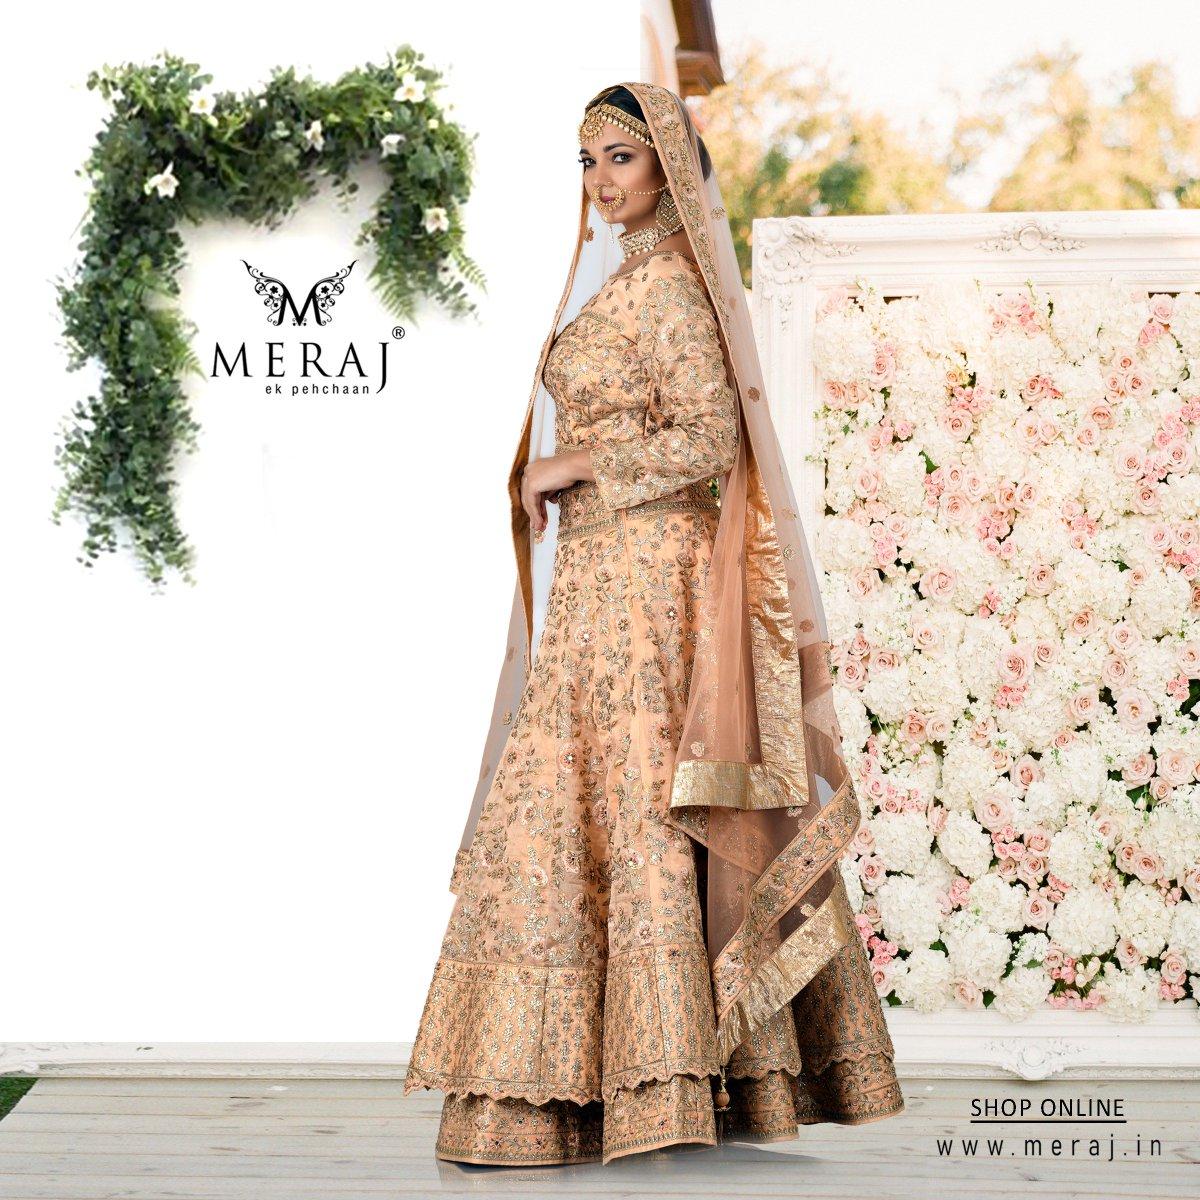 63bf567ec1 An astonishing Light Peach coloured Lehenga Choli exhibiting the real  beauty of silk and net fabrics